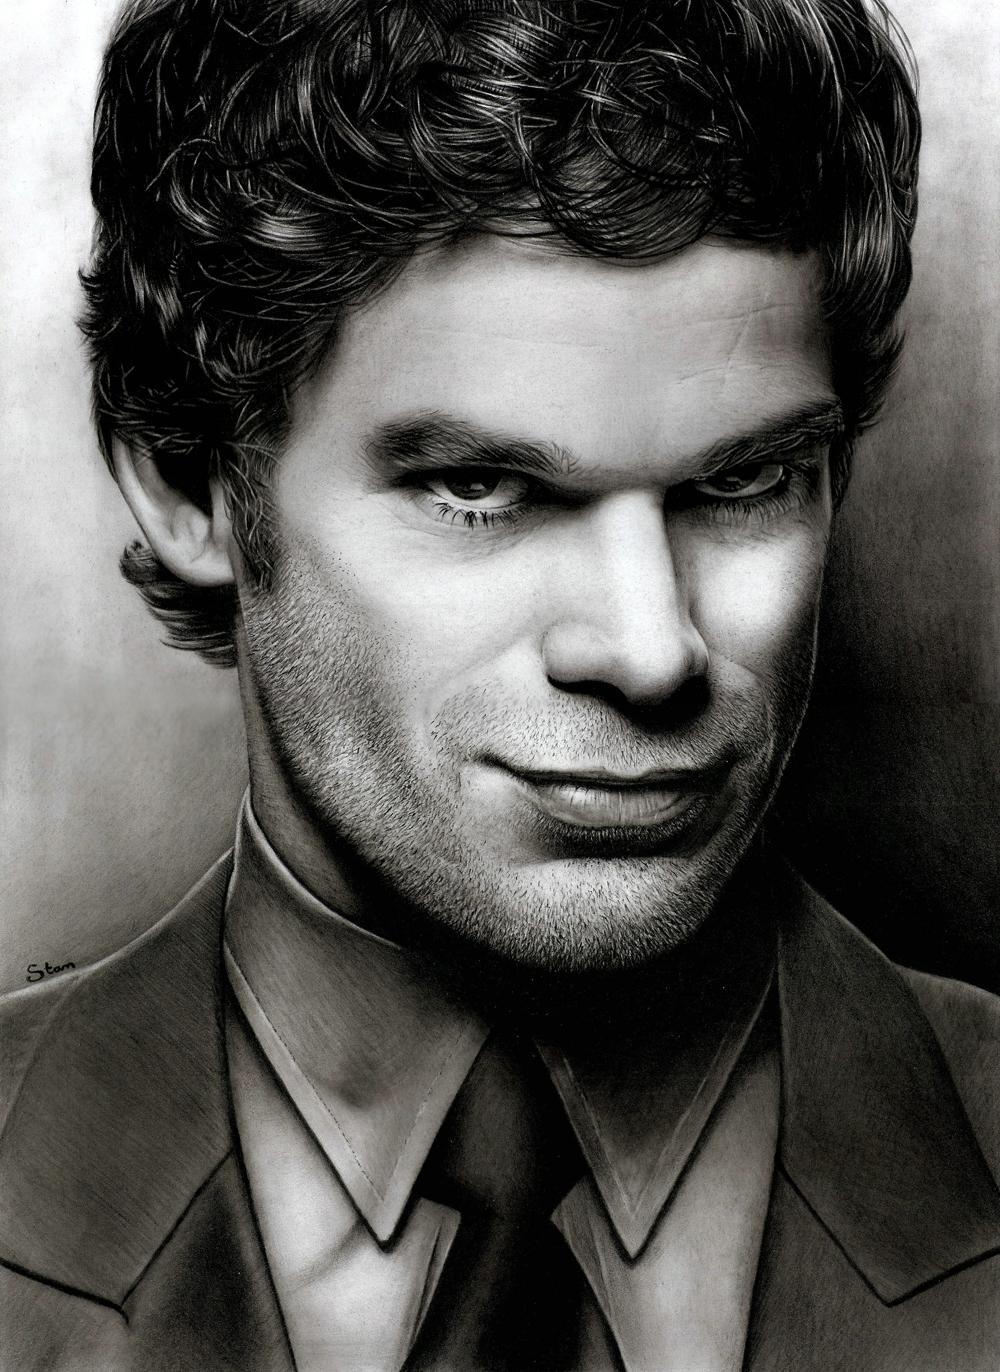 Dexter Morgan by Stanbos